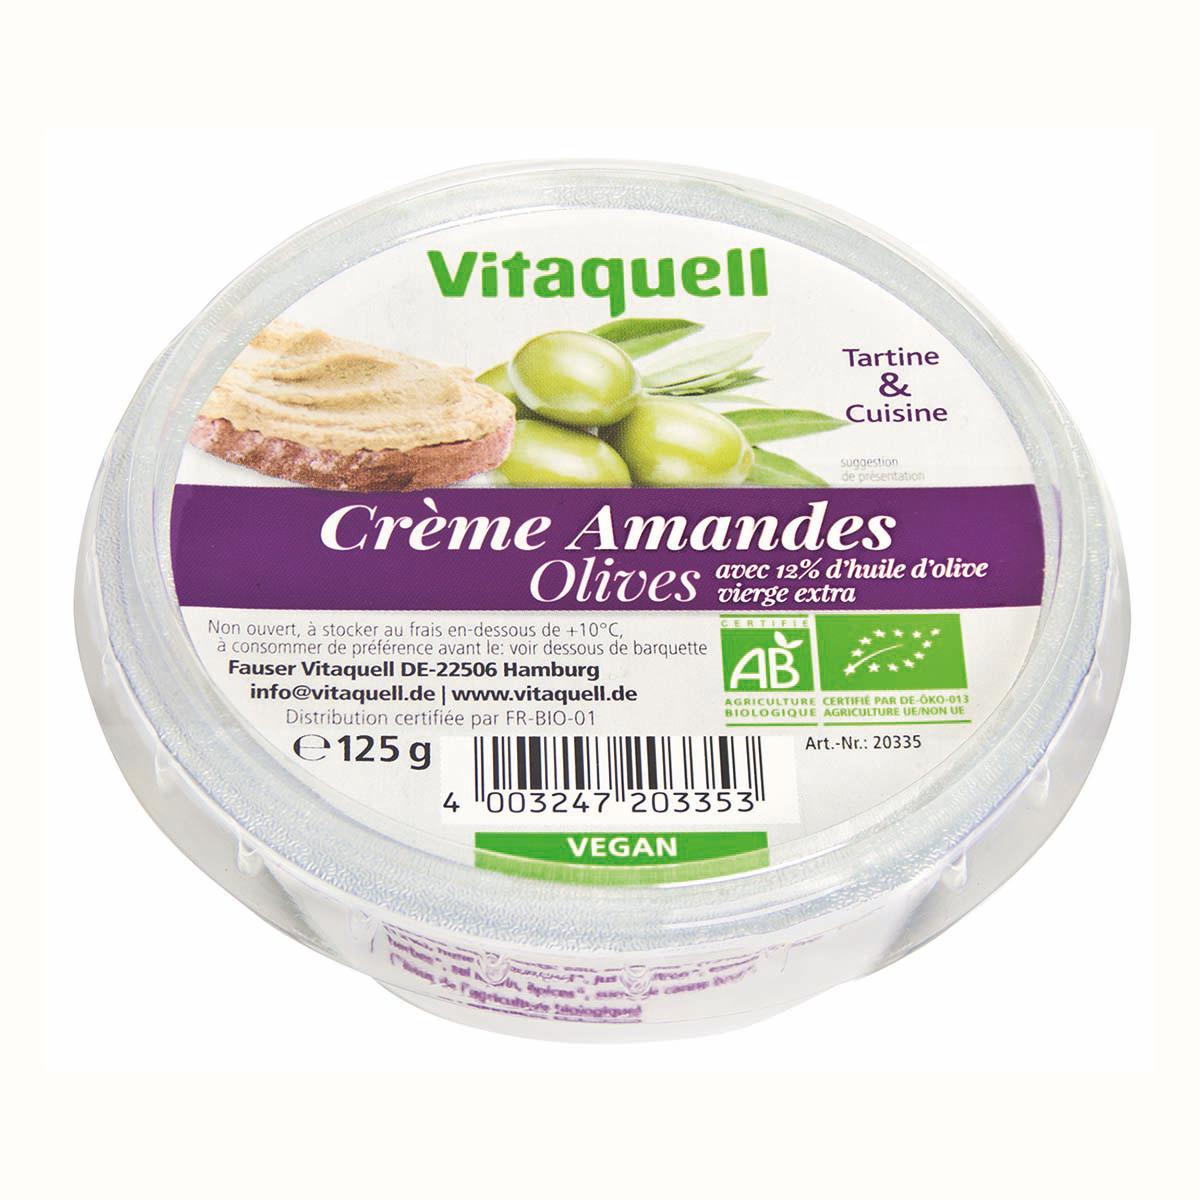 Crème Amandes Olives